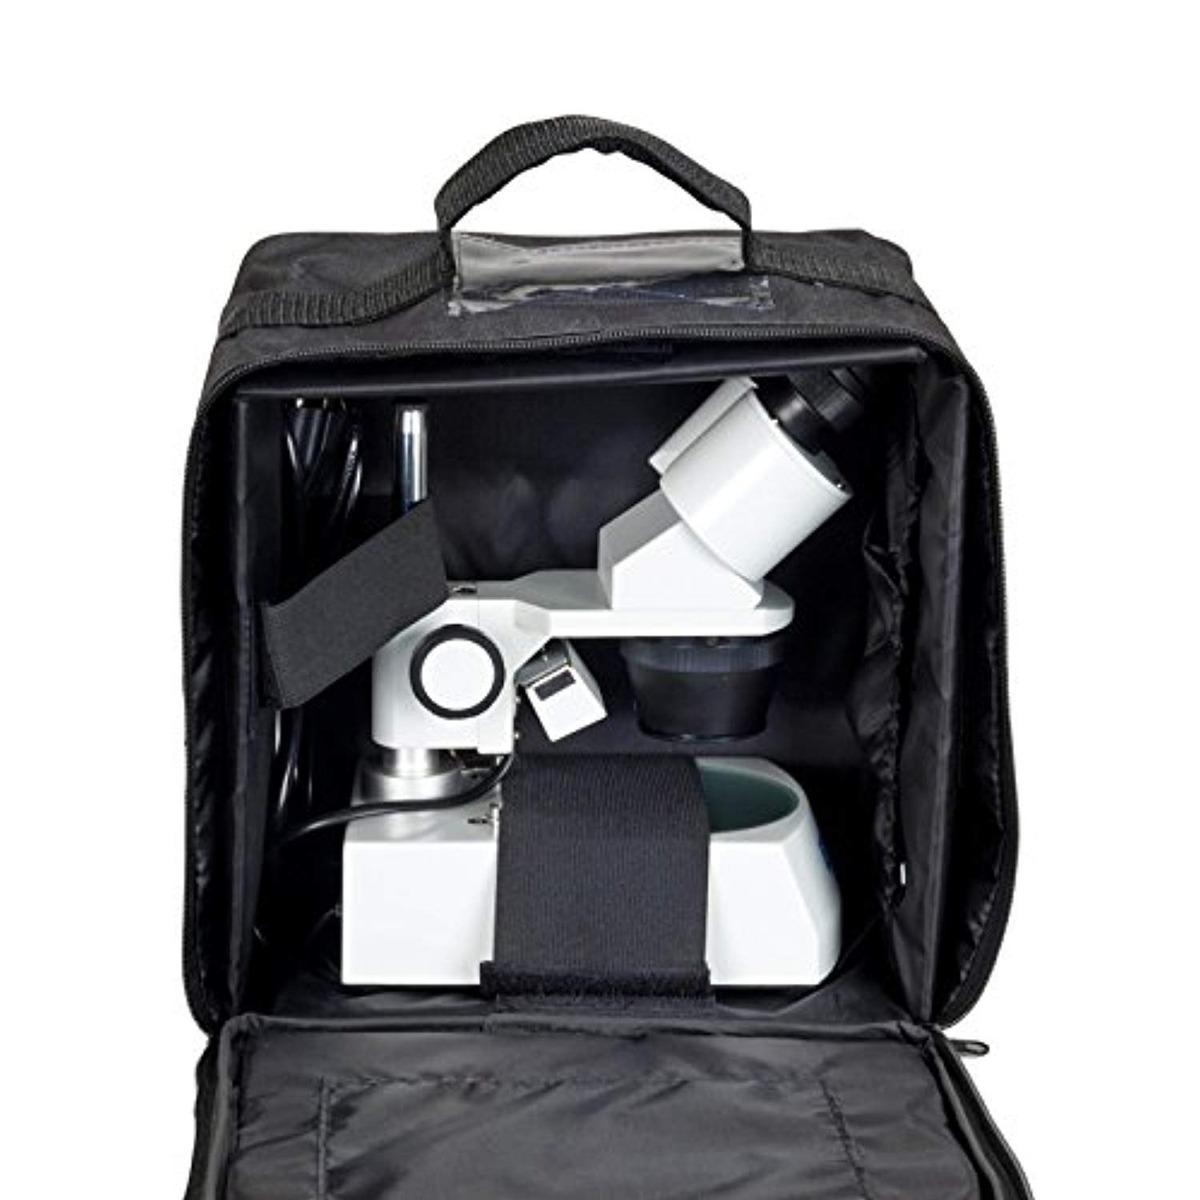 OMAX Vinyl Microscope Carrying Case 10x6x11 for G223E G223C G226C Stereo Microscopes